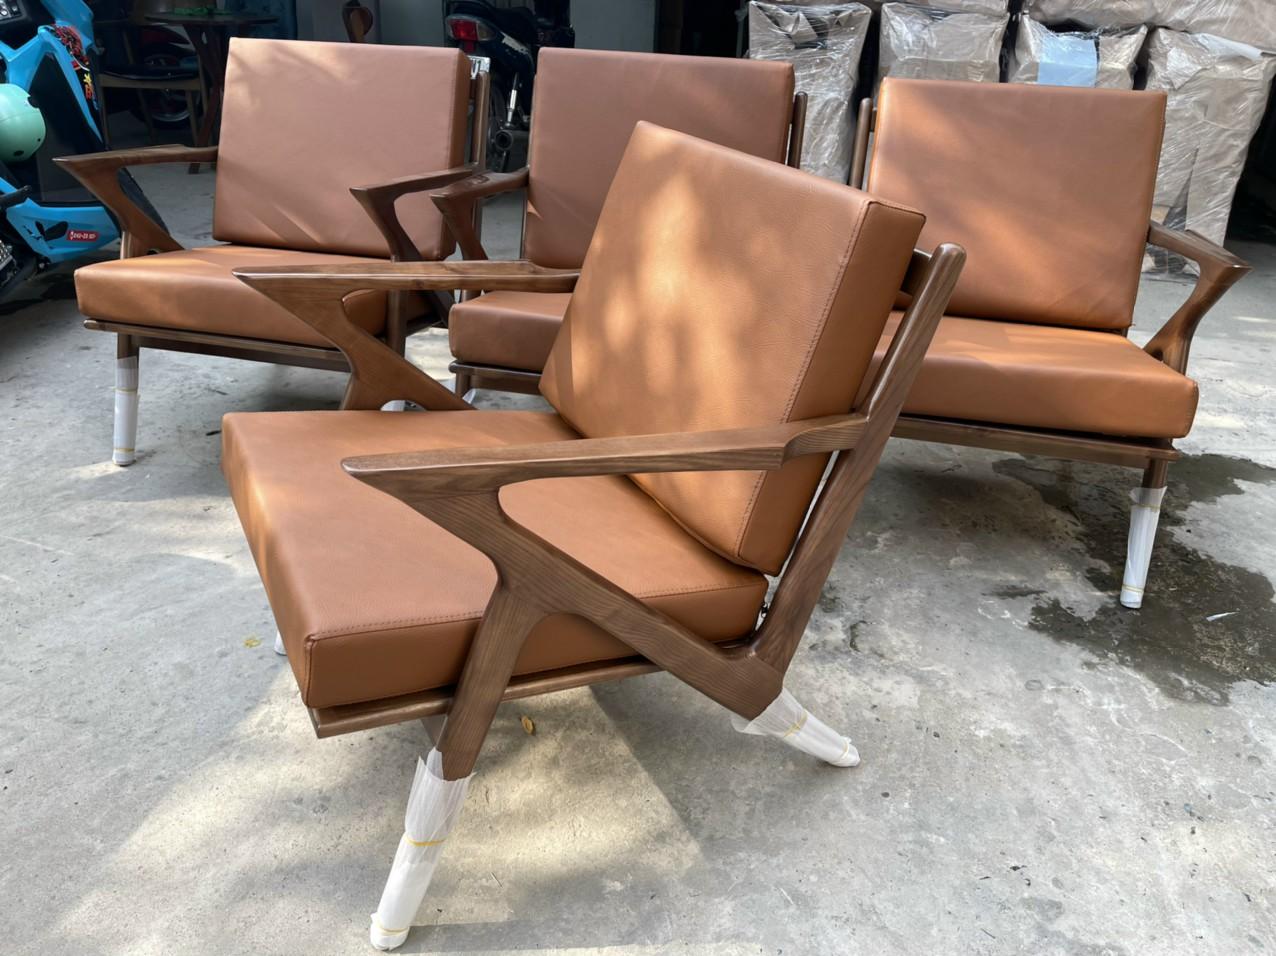 Sofa cafe chữ Z gỗ ash